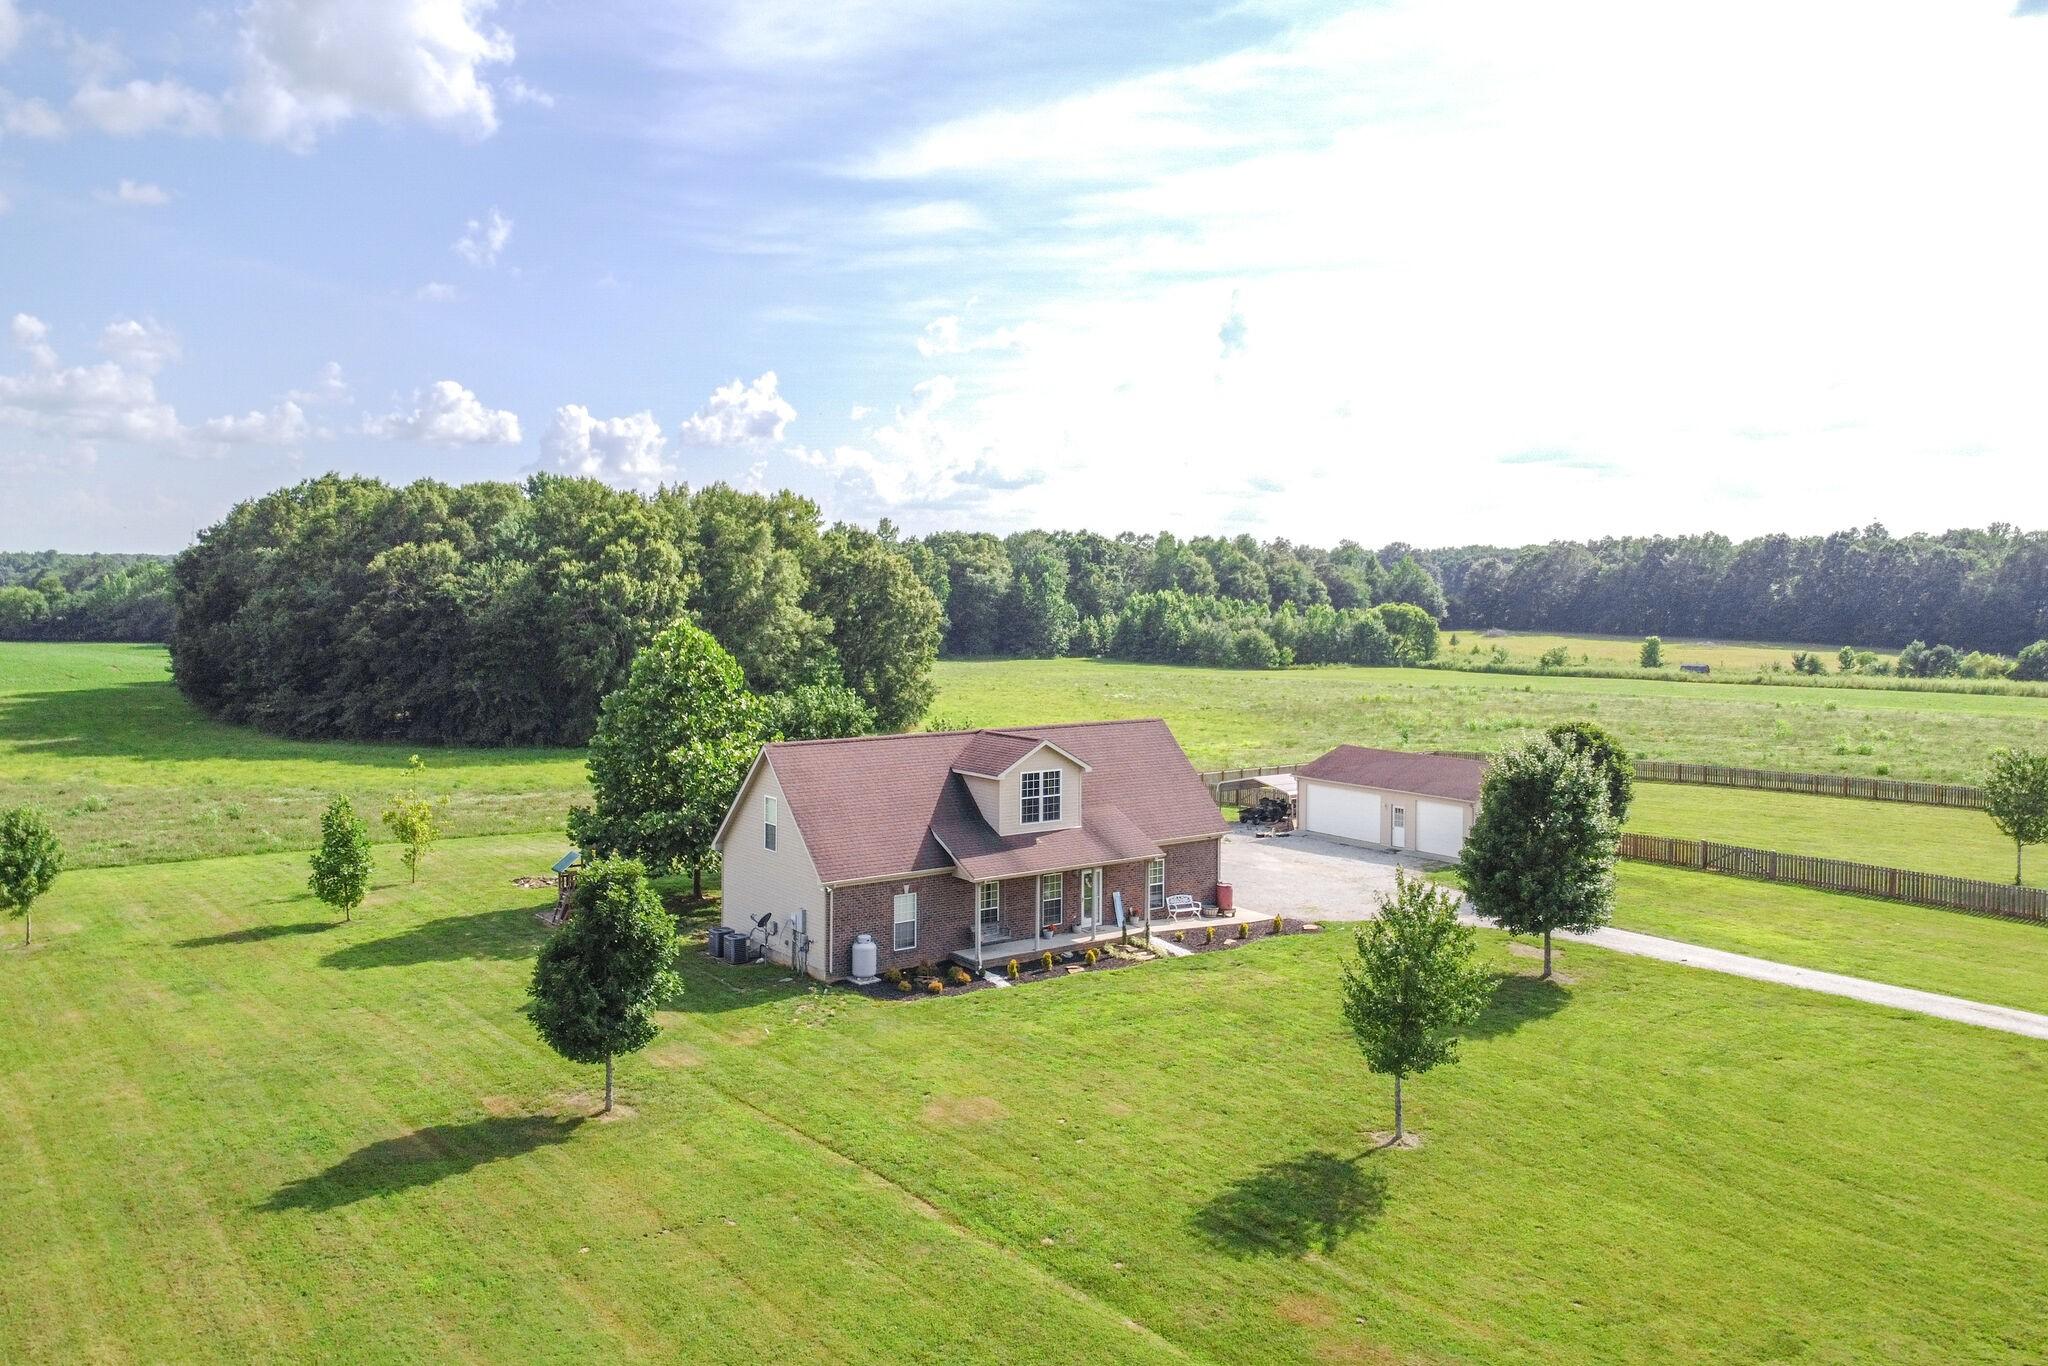 987 Boynton Valley Rd Property Photo - Manchester, TN real estate listing